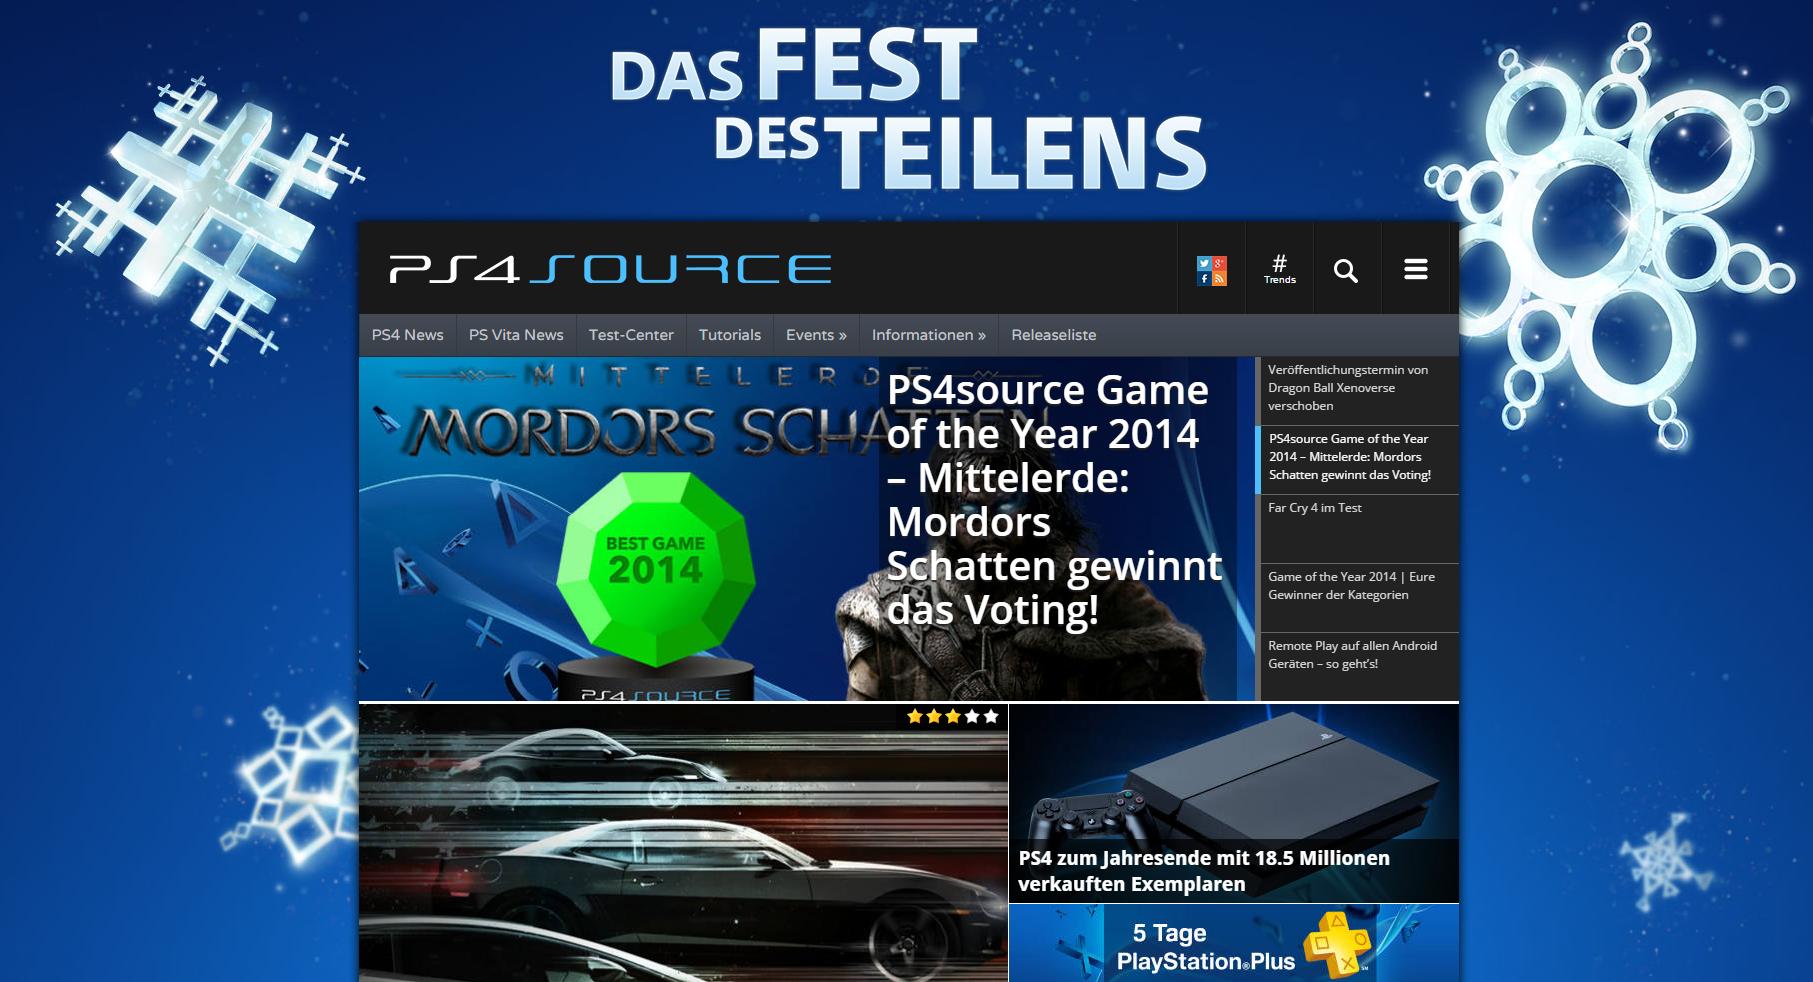 PS4-Source